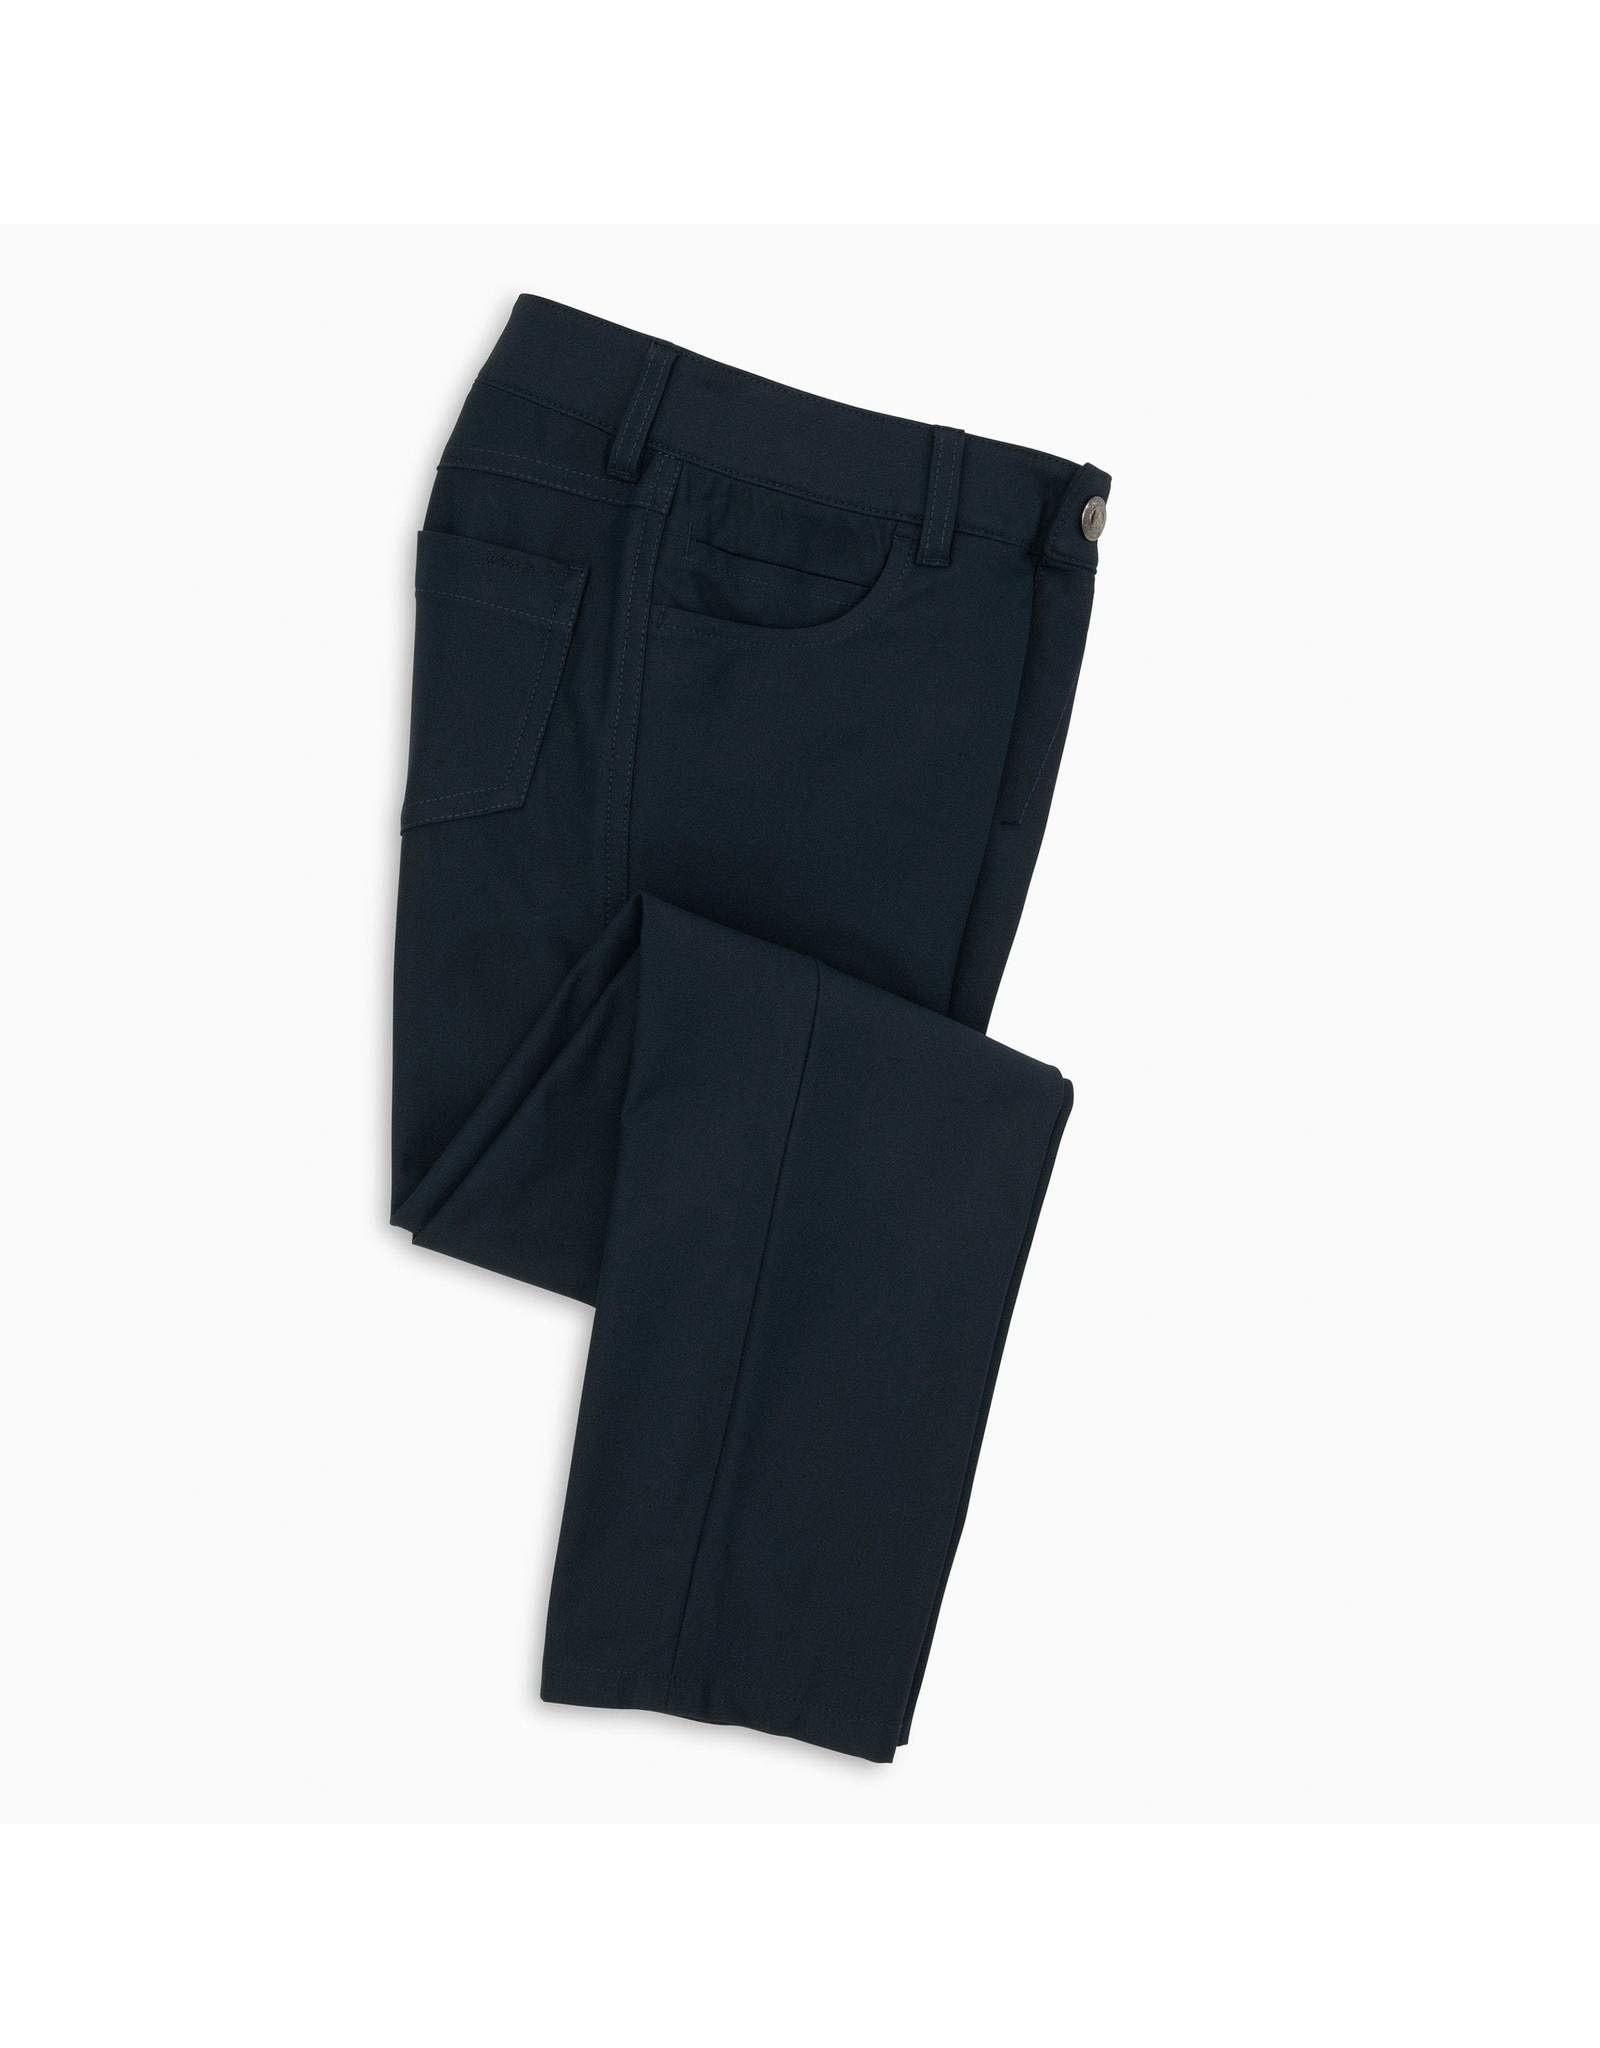 JO Cross Country Pants